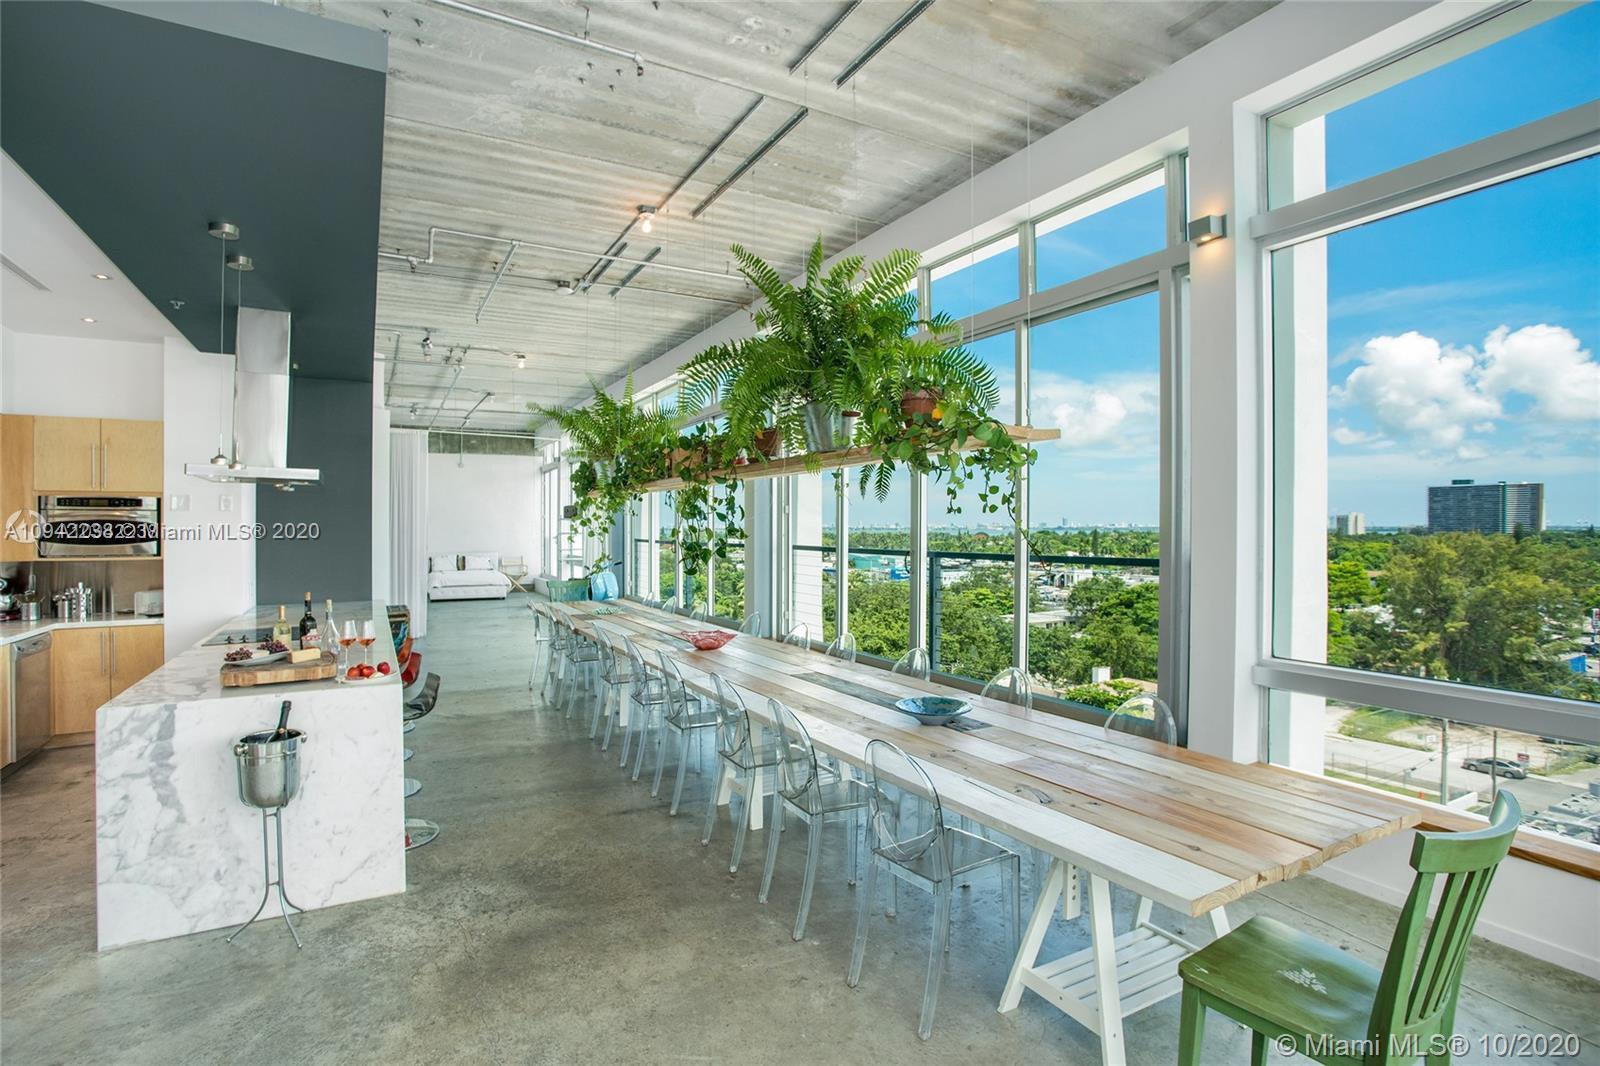 8101 Biscayne Blvd # 705, Miami, Florida 33138, ,2 BathroomsBathrooms,Residential,For Sale,8101 Biscayne Blvd # 705,A10942238